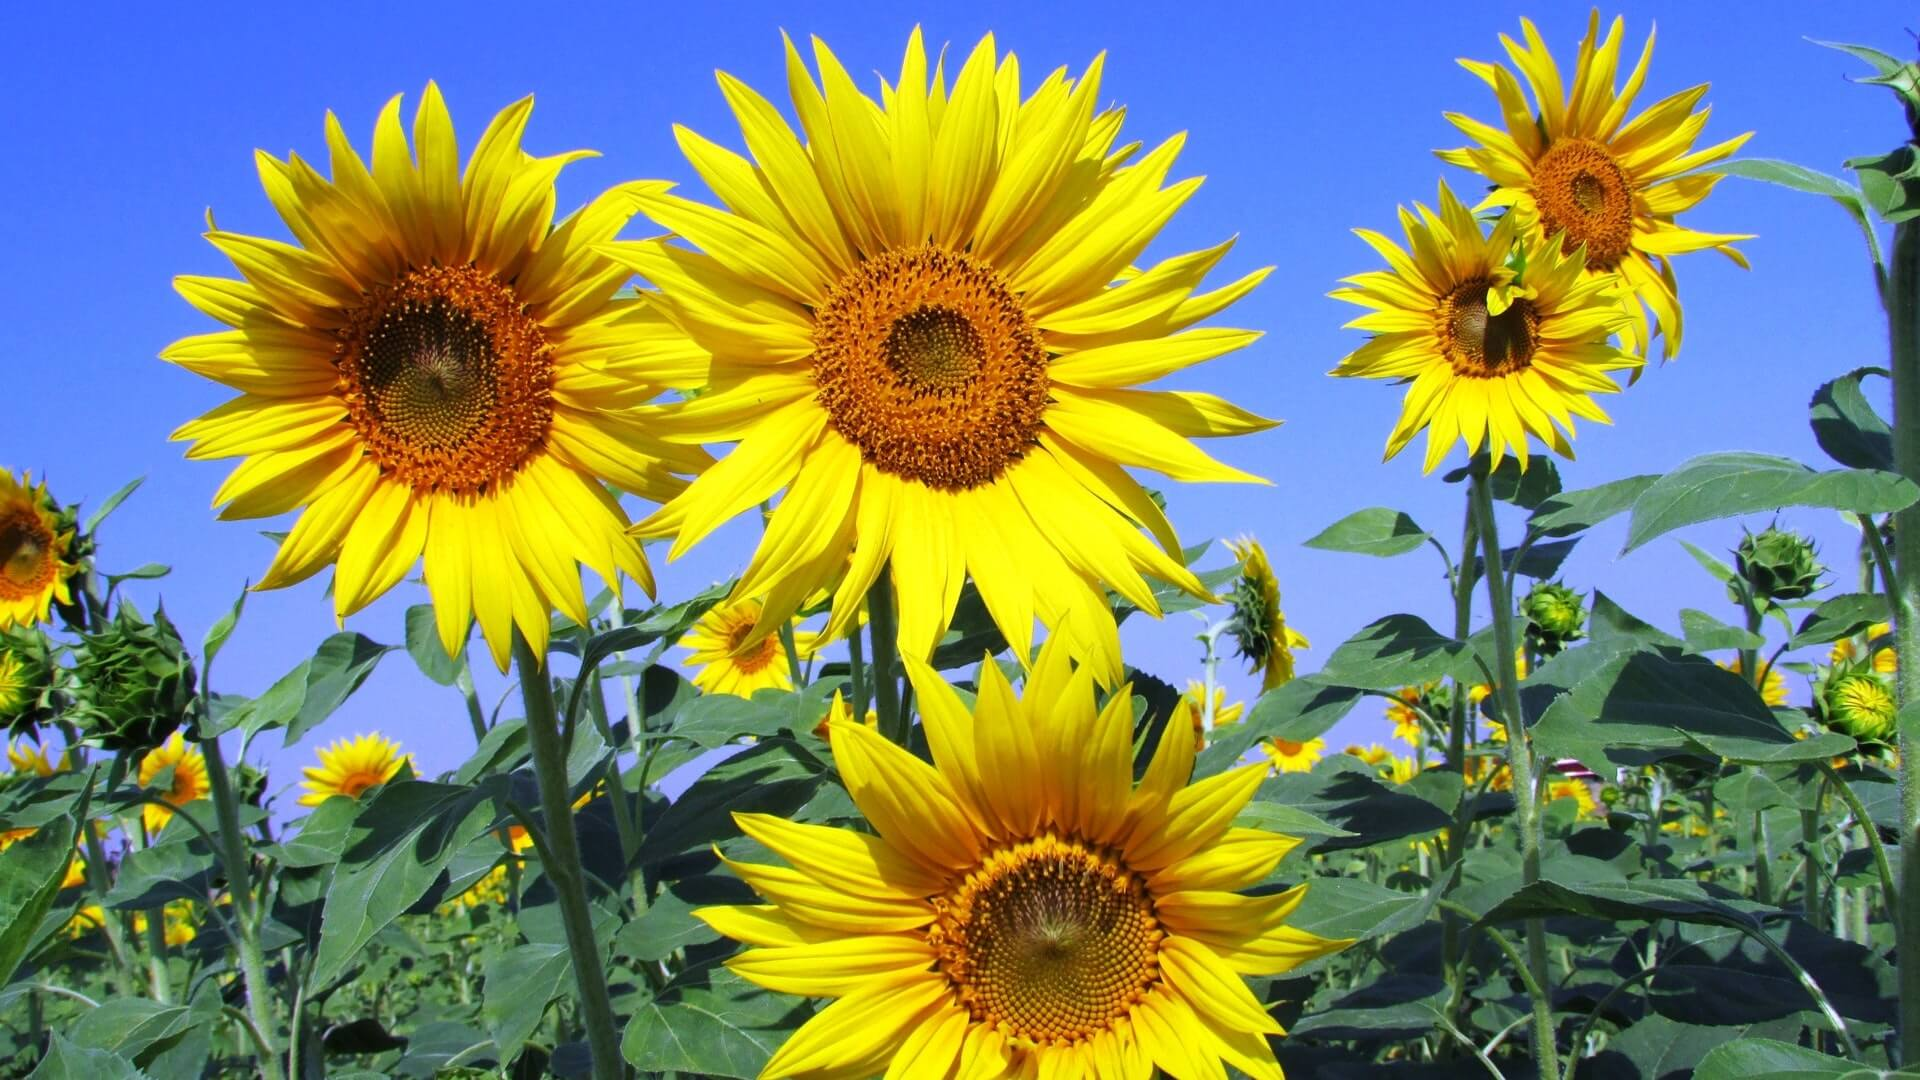 Sonnenblumen_pexels